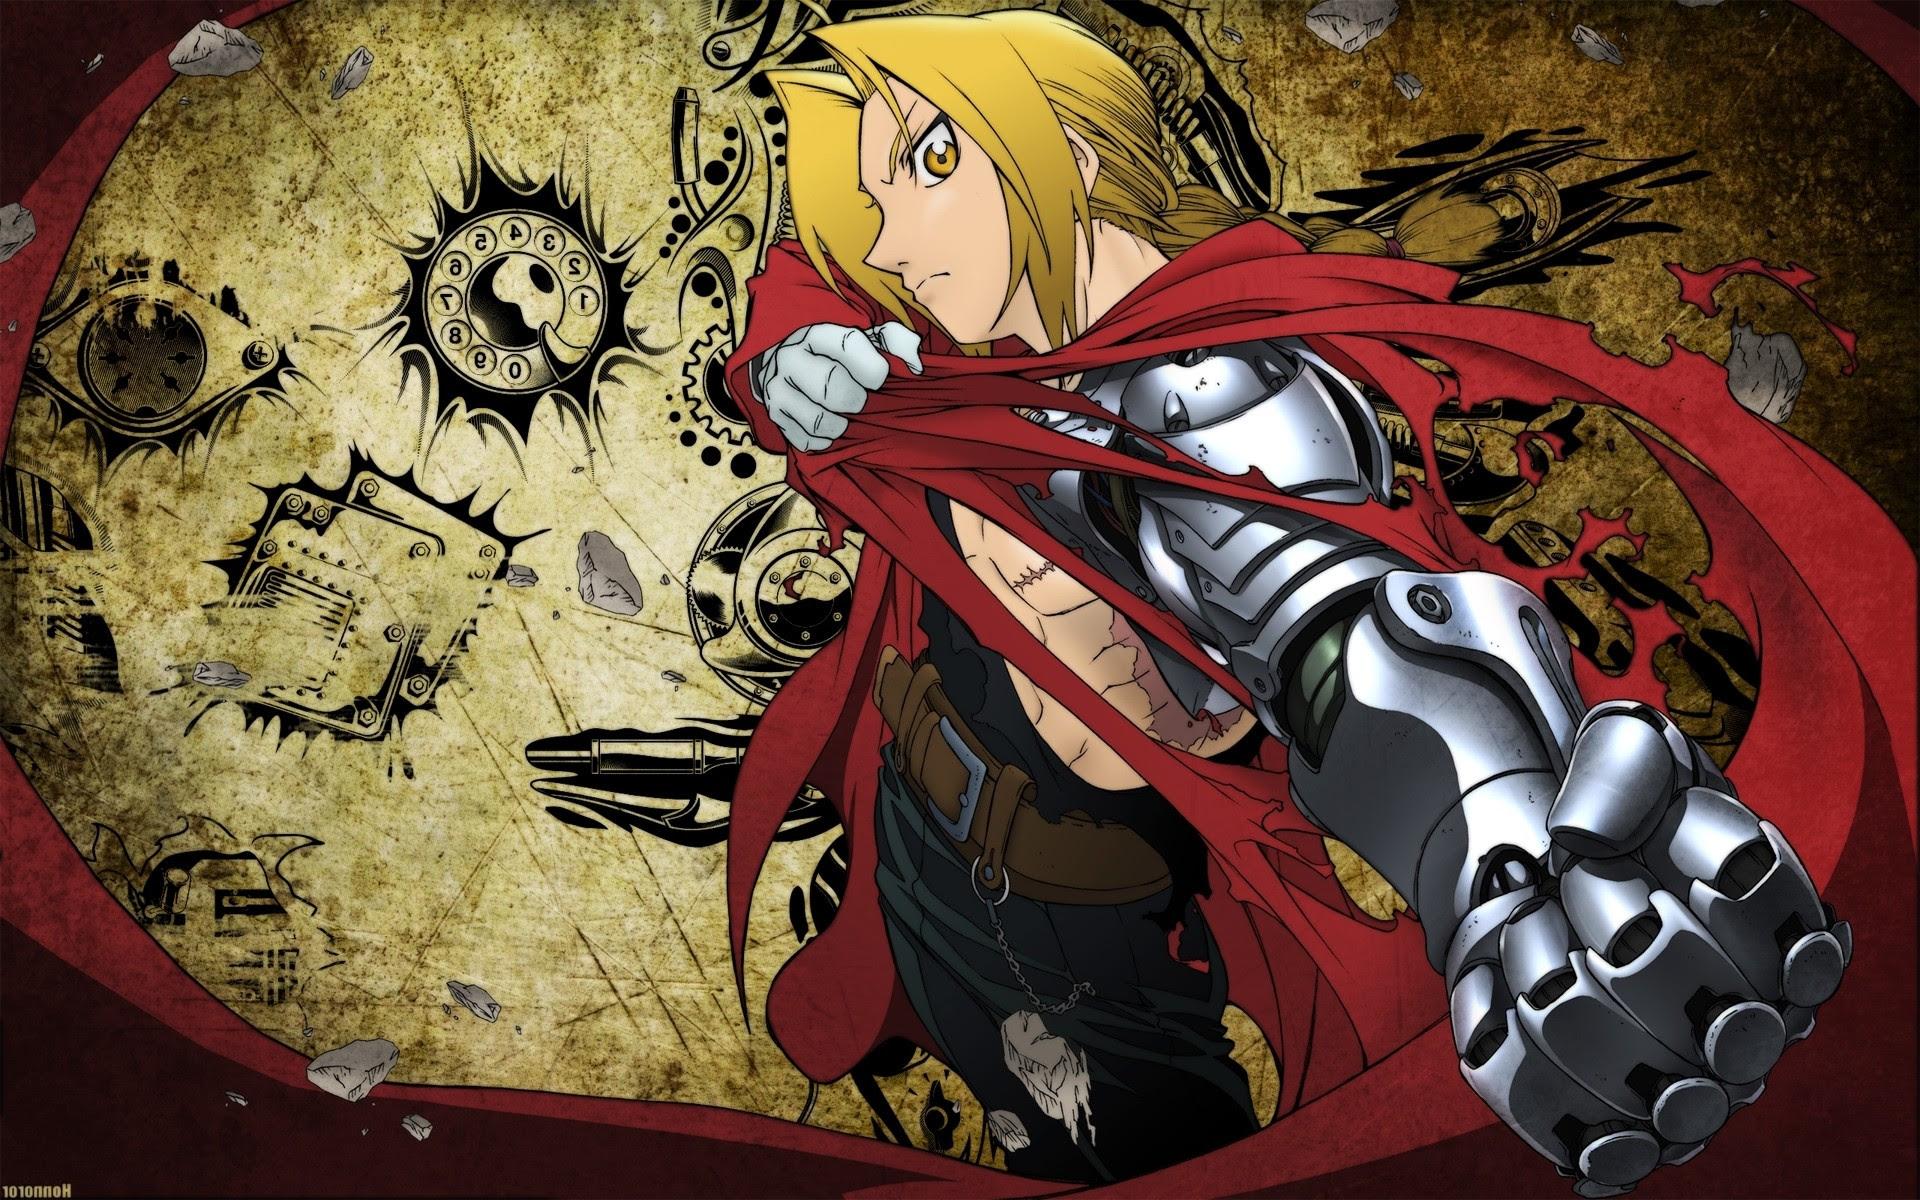 Fullmetal Alchemist Iphone Wallpaper 52 Images